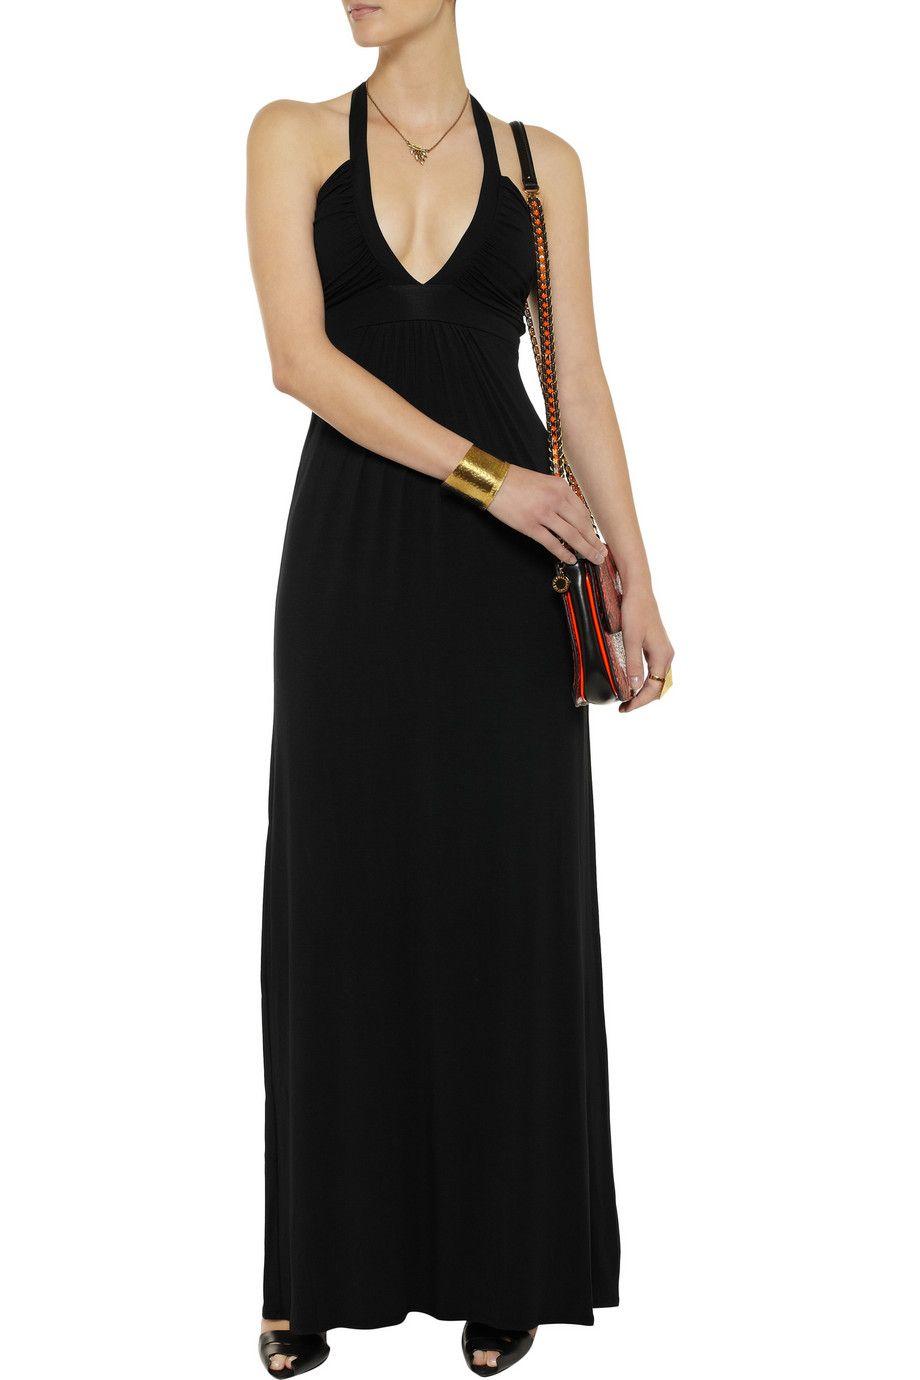 Tart Stretch-modal jersey halterneck maxi dress